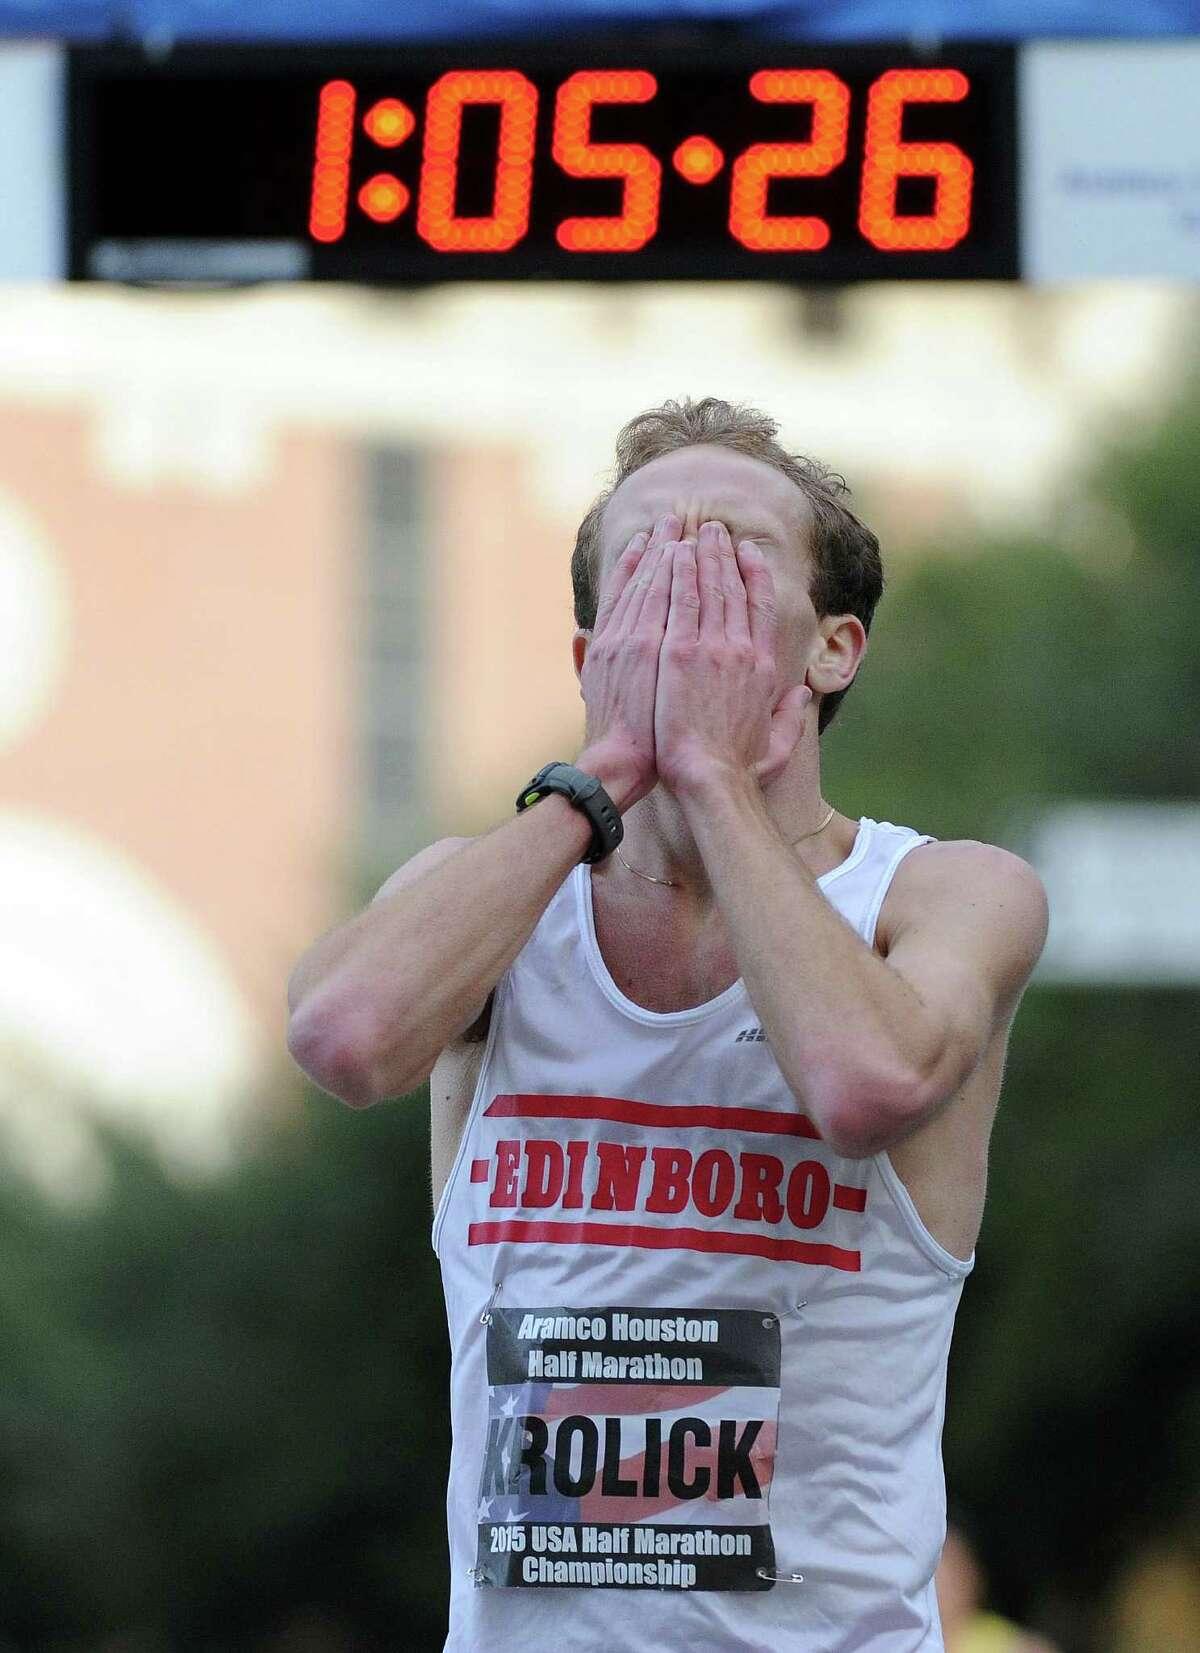 Jacob Krolick reacts after finishing the half-marathon championship during the Houston Marathon, Sunday, January 18, 2015 in Houston.